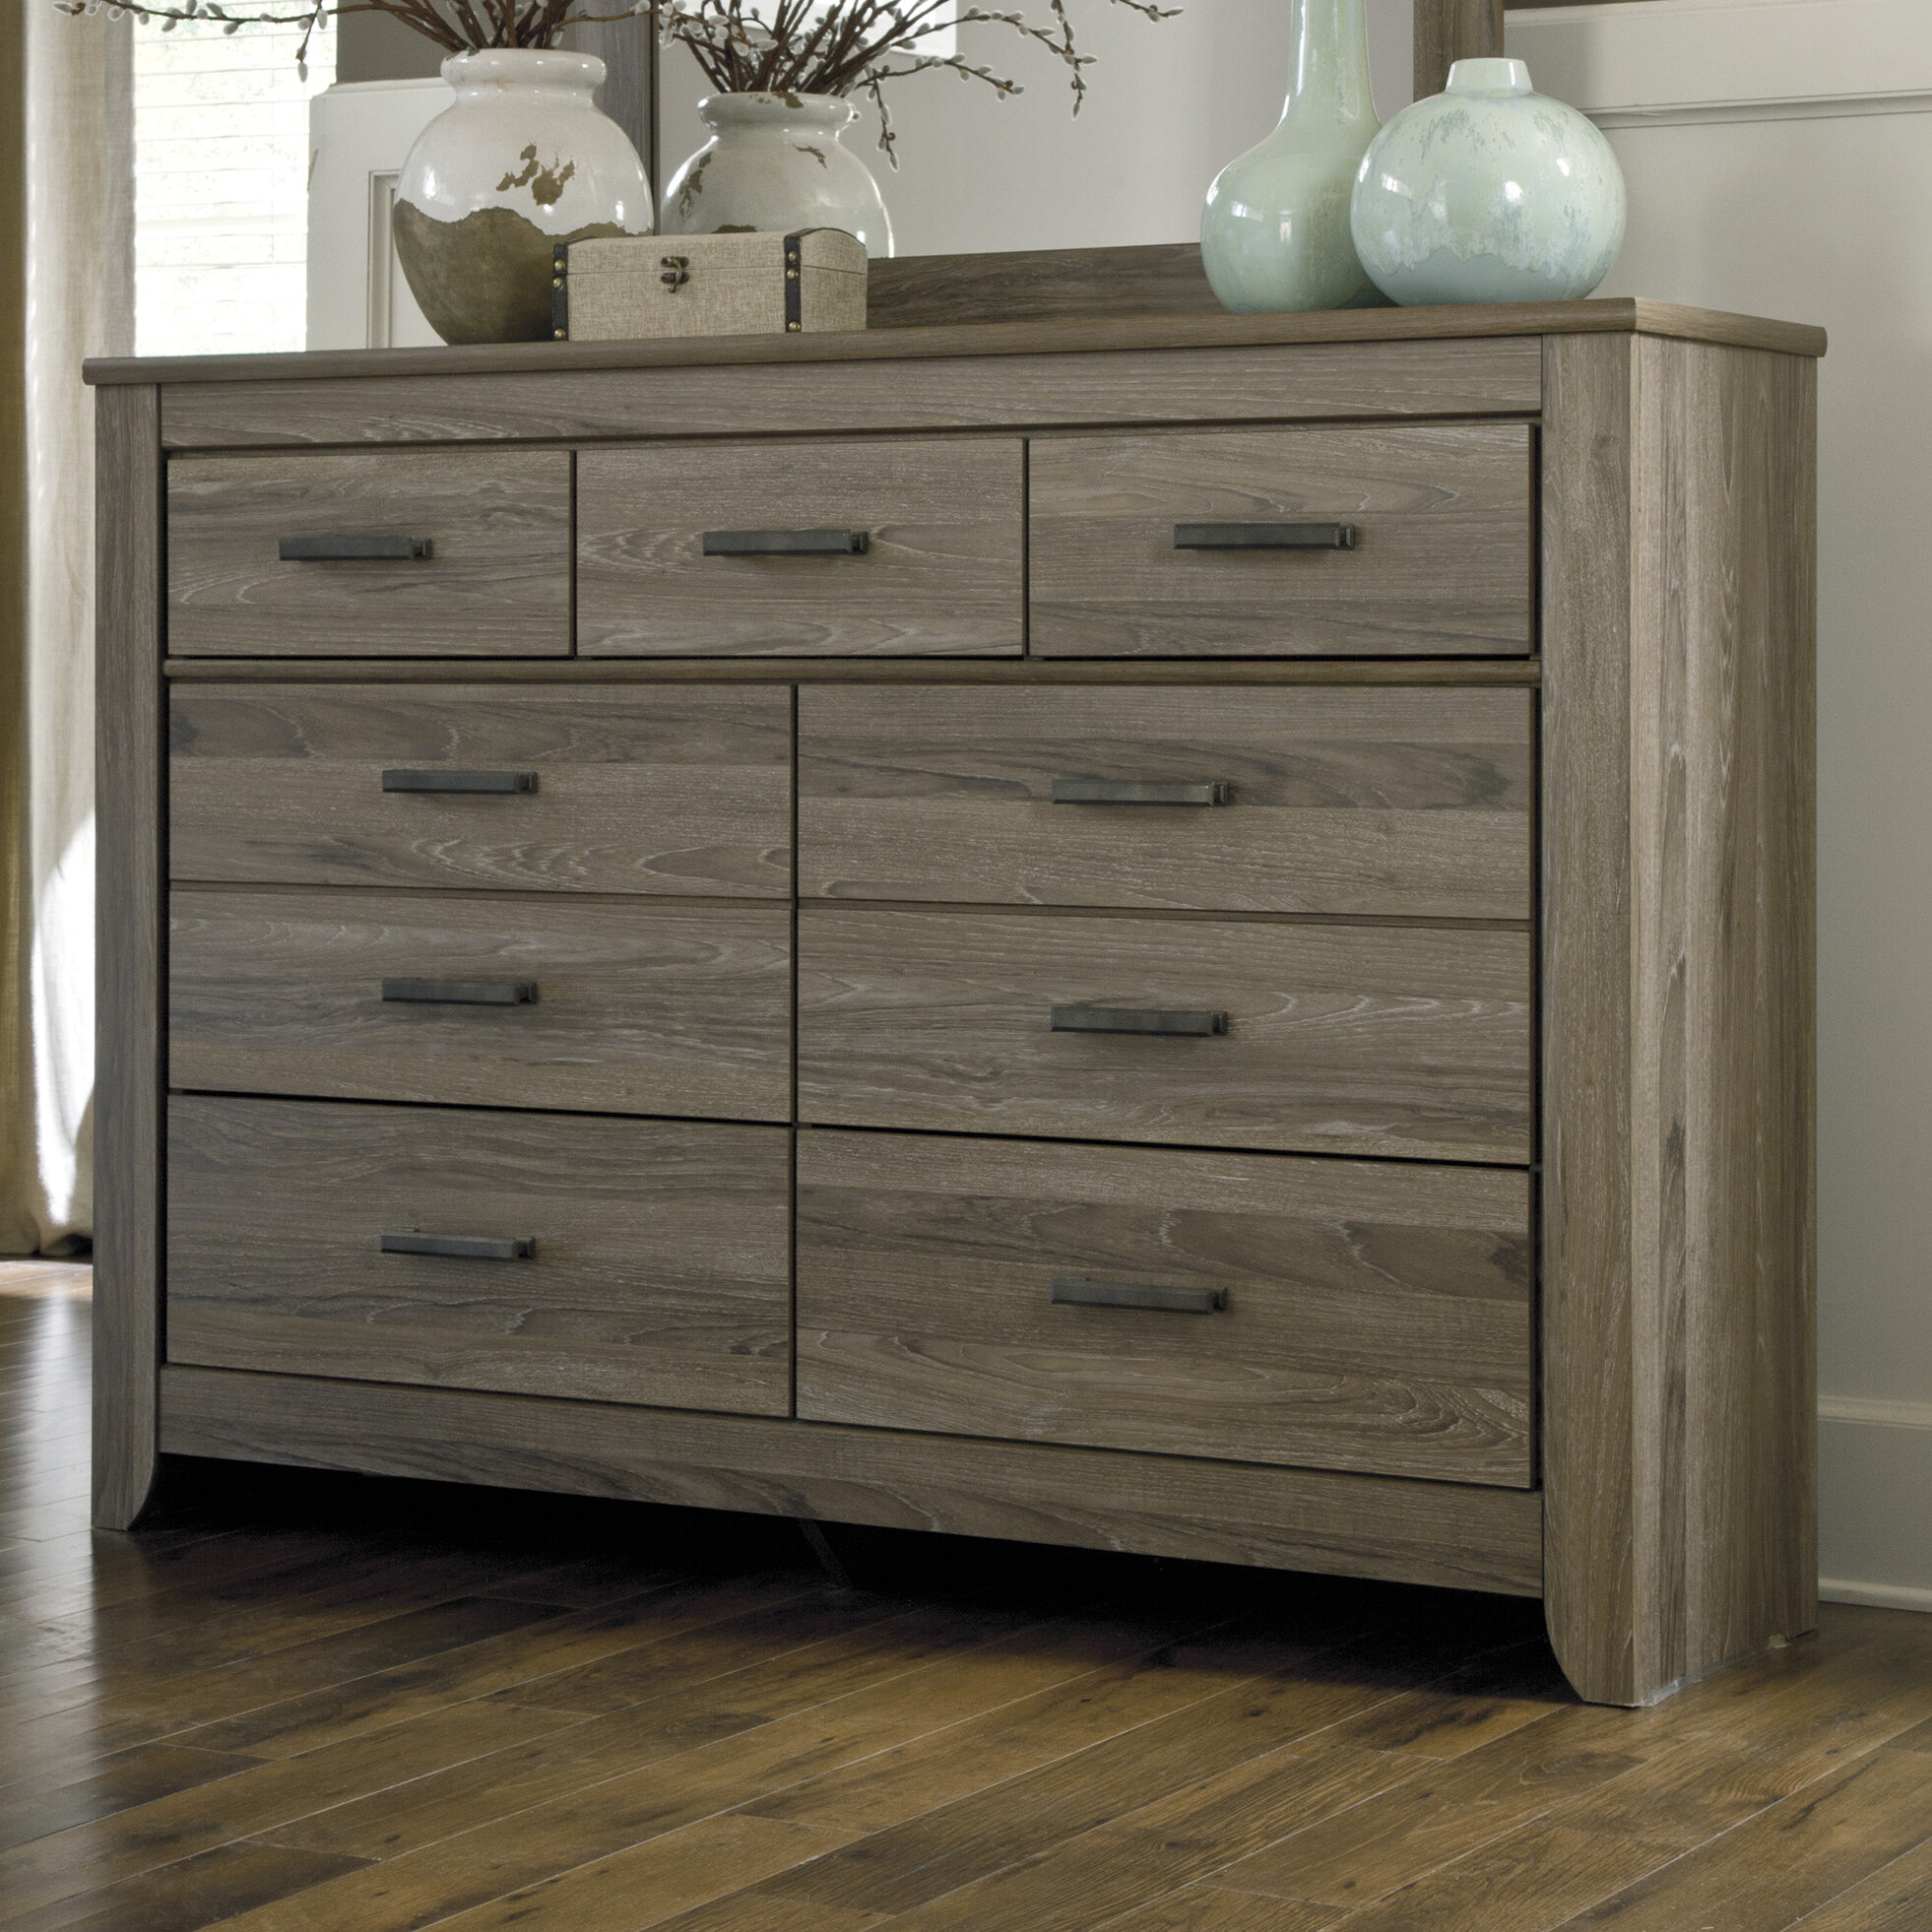 Trent Austin Design Herard 7 Drawer Dresser U0026 Reviews | Wayfair